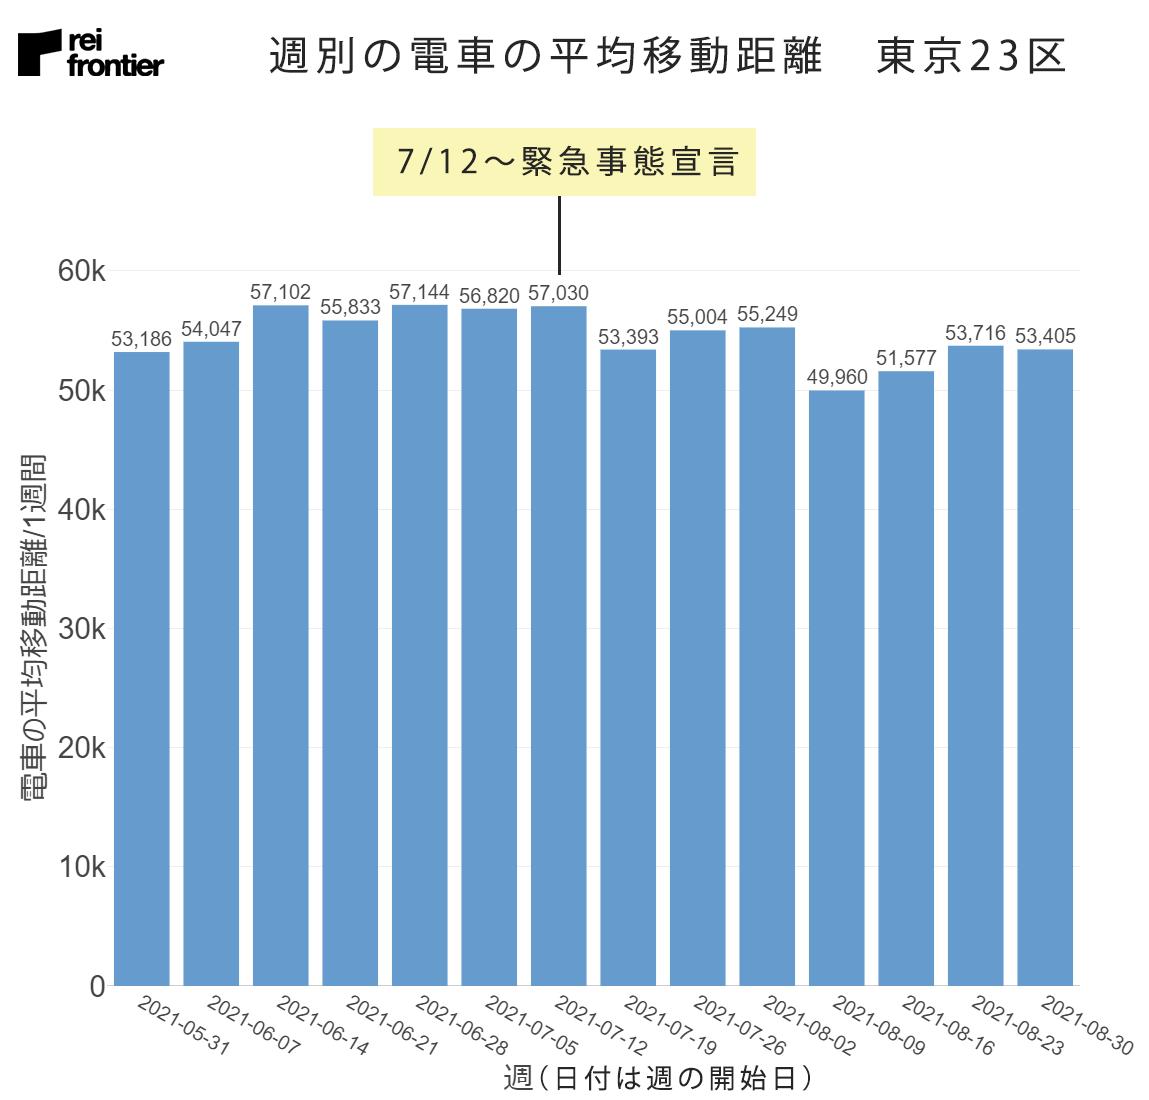 週別の電車の平均移動距離 東京23区